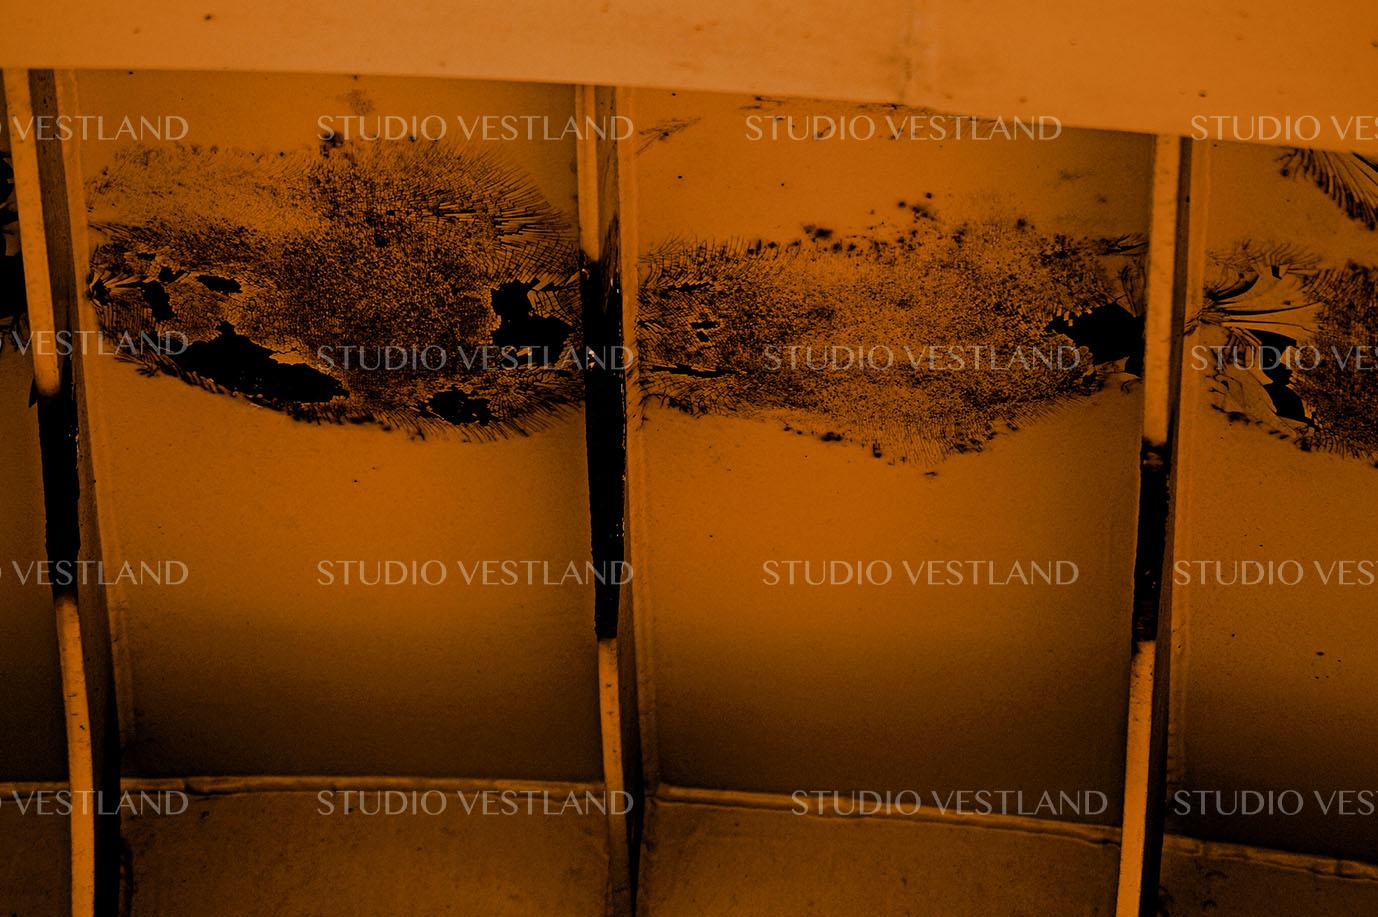 Studio Vestland - Trommelkunst 13